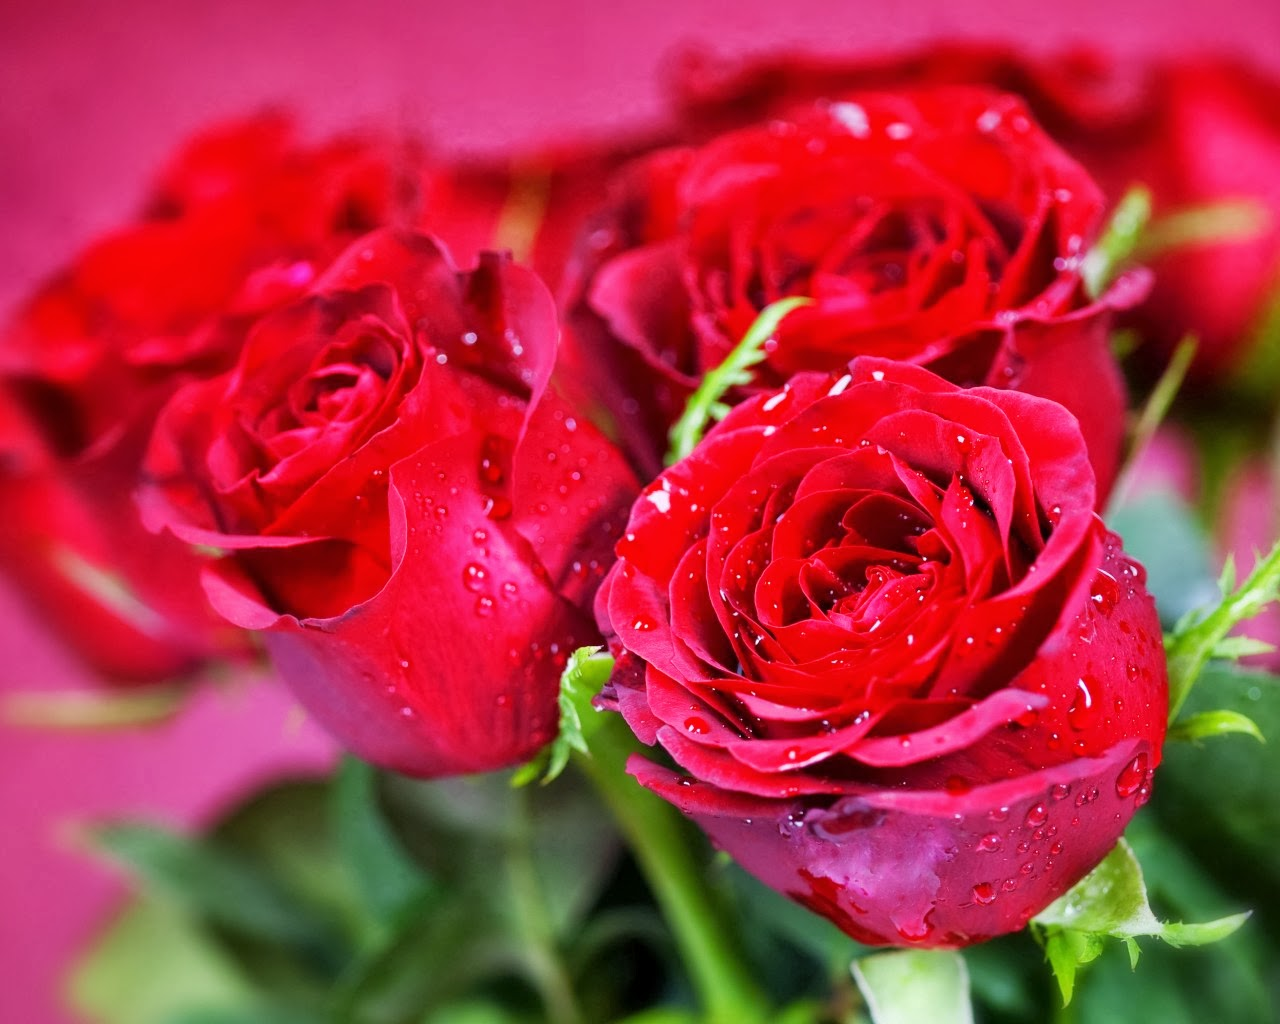 4f77ddbfc صور خلفيات ورد جوري احمر 2019 وابيض طبيعي Beautiful red rose flowers ...